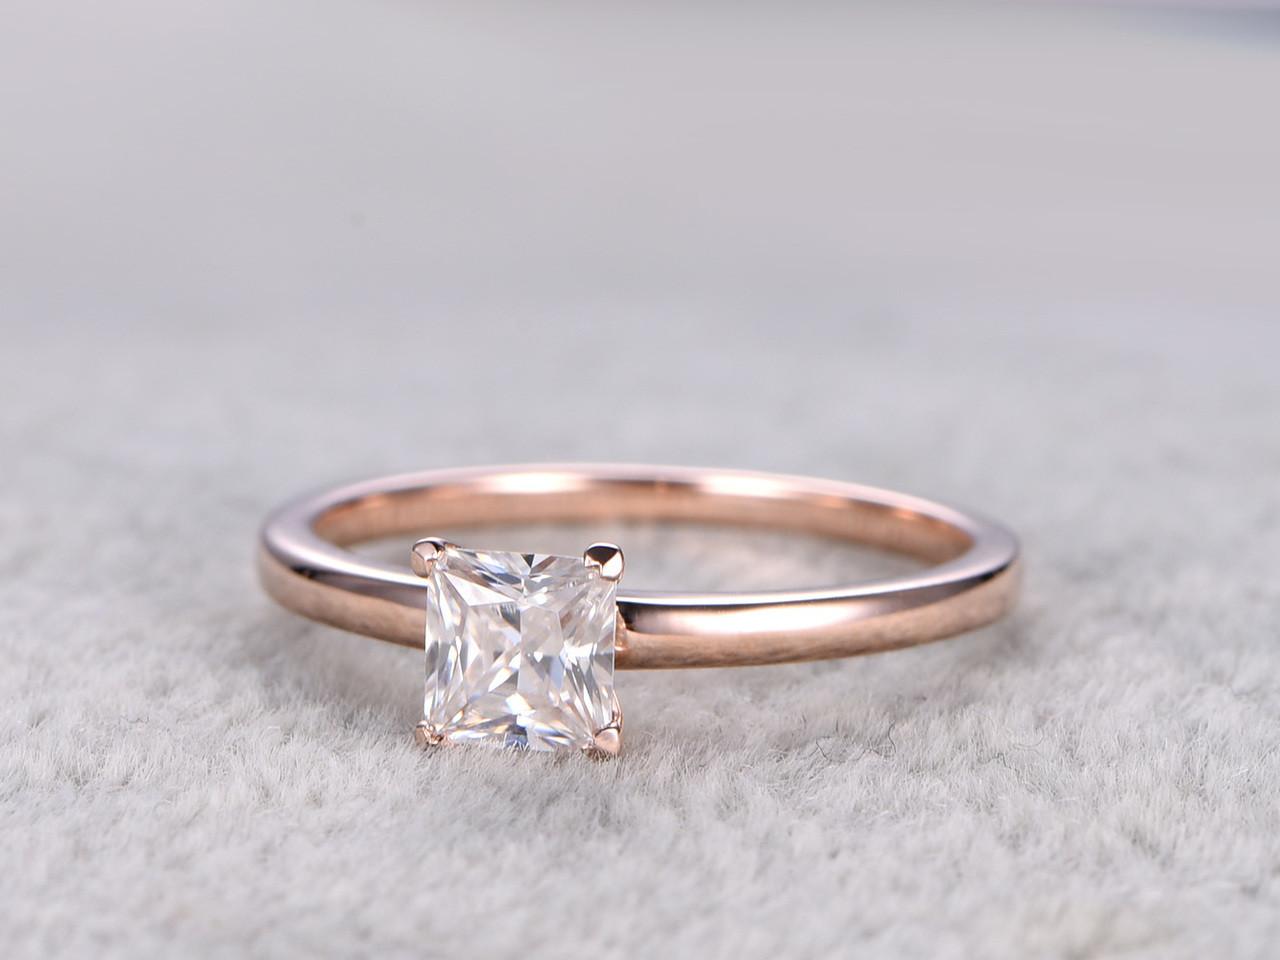 Moissanite princess cut engagement ring